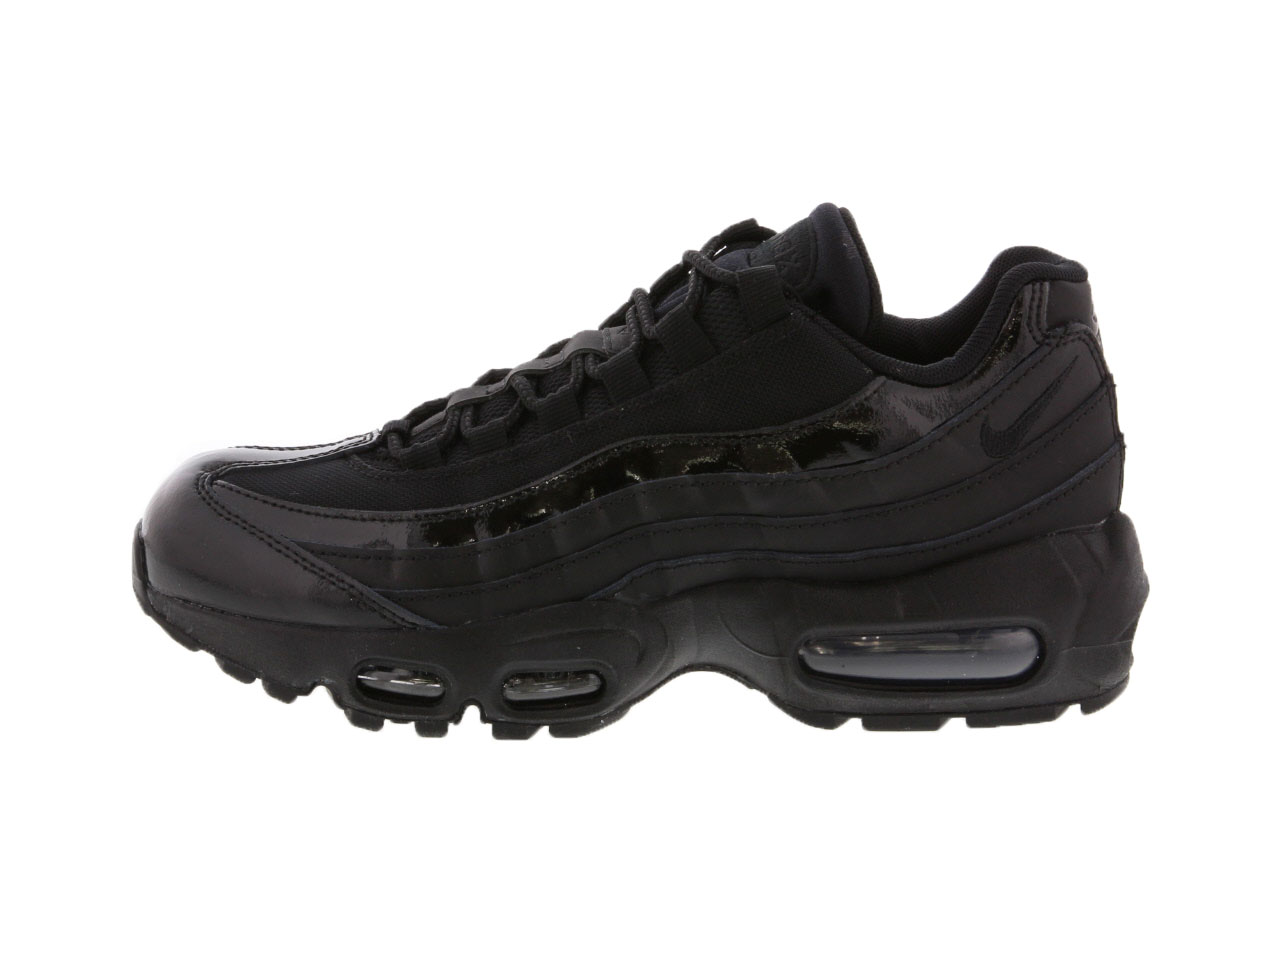 【20%OFF!】NIKE WOMENS AIR MAX 95(307960-010)【ナイキ ウィメンズ エアマックス95】【レディースファッション】【シューズ】【靴】【スニーカー】【フットウェア】